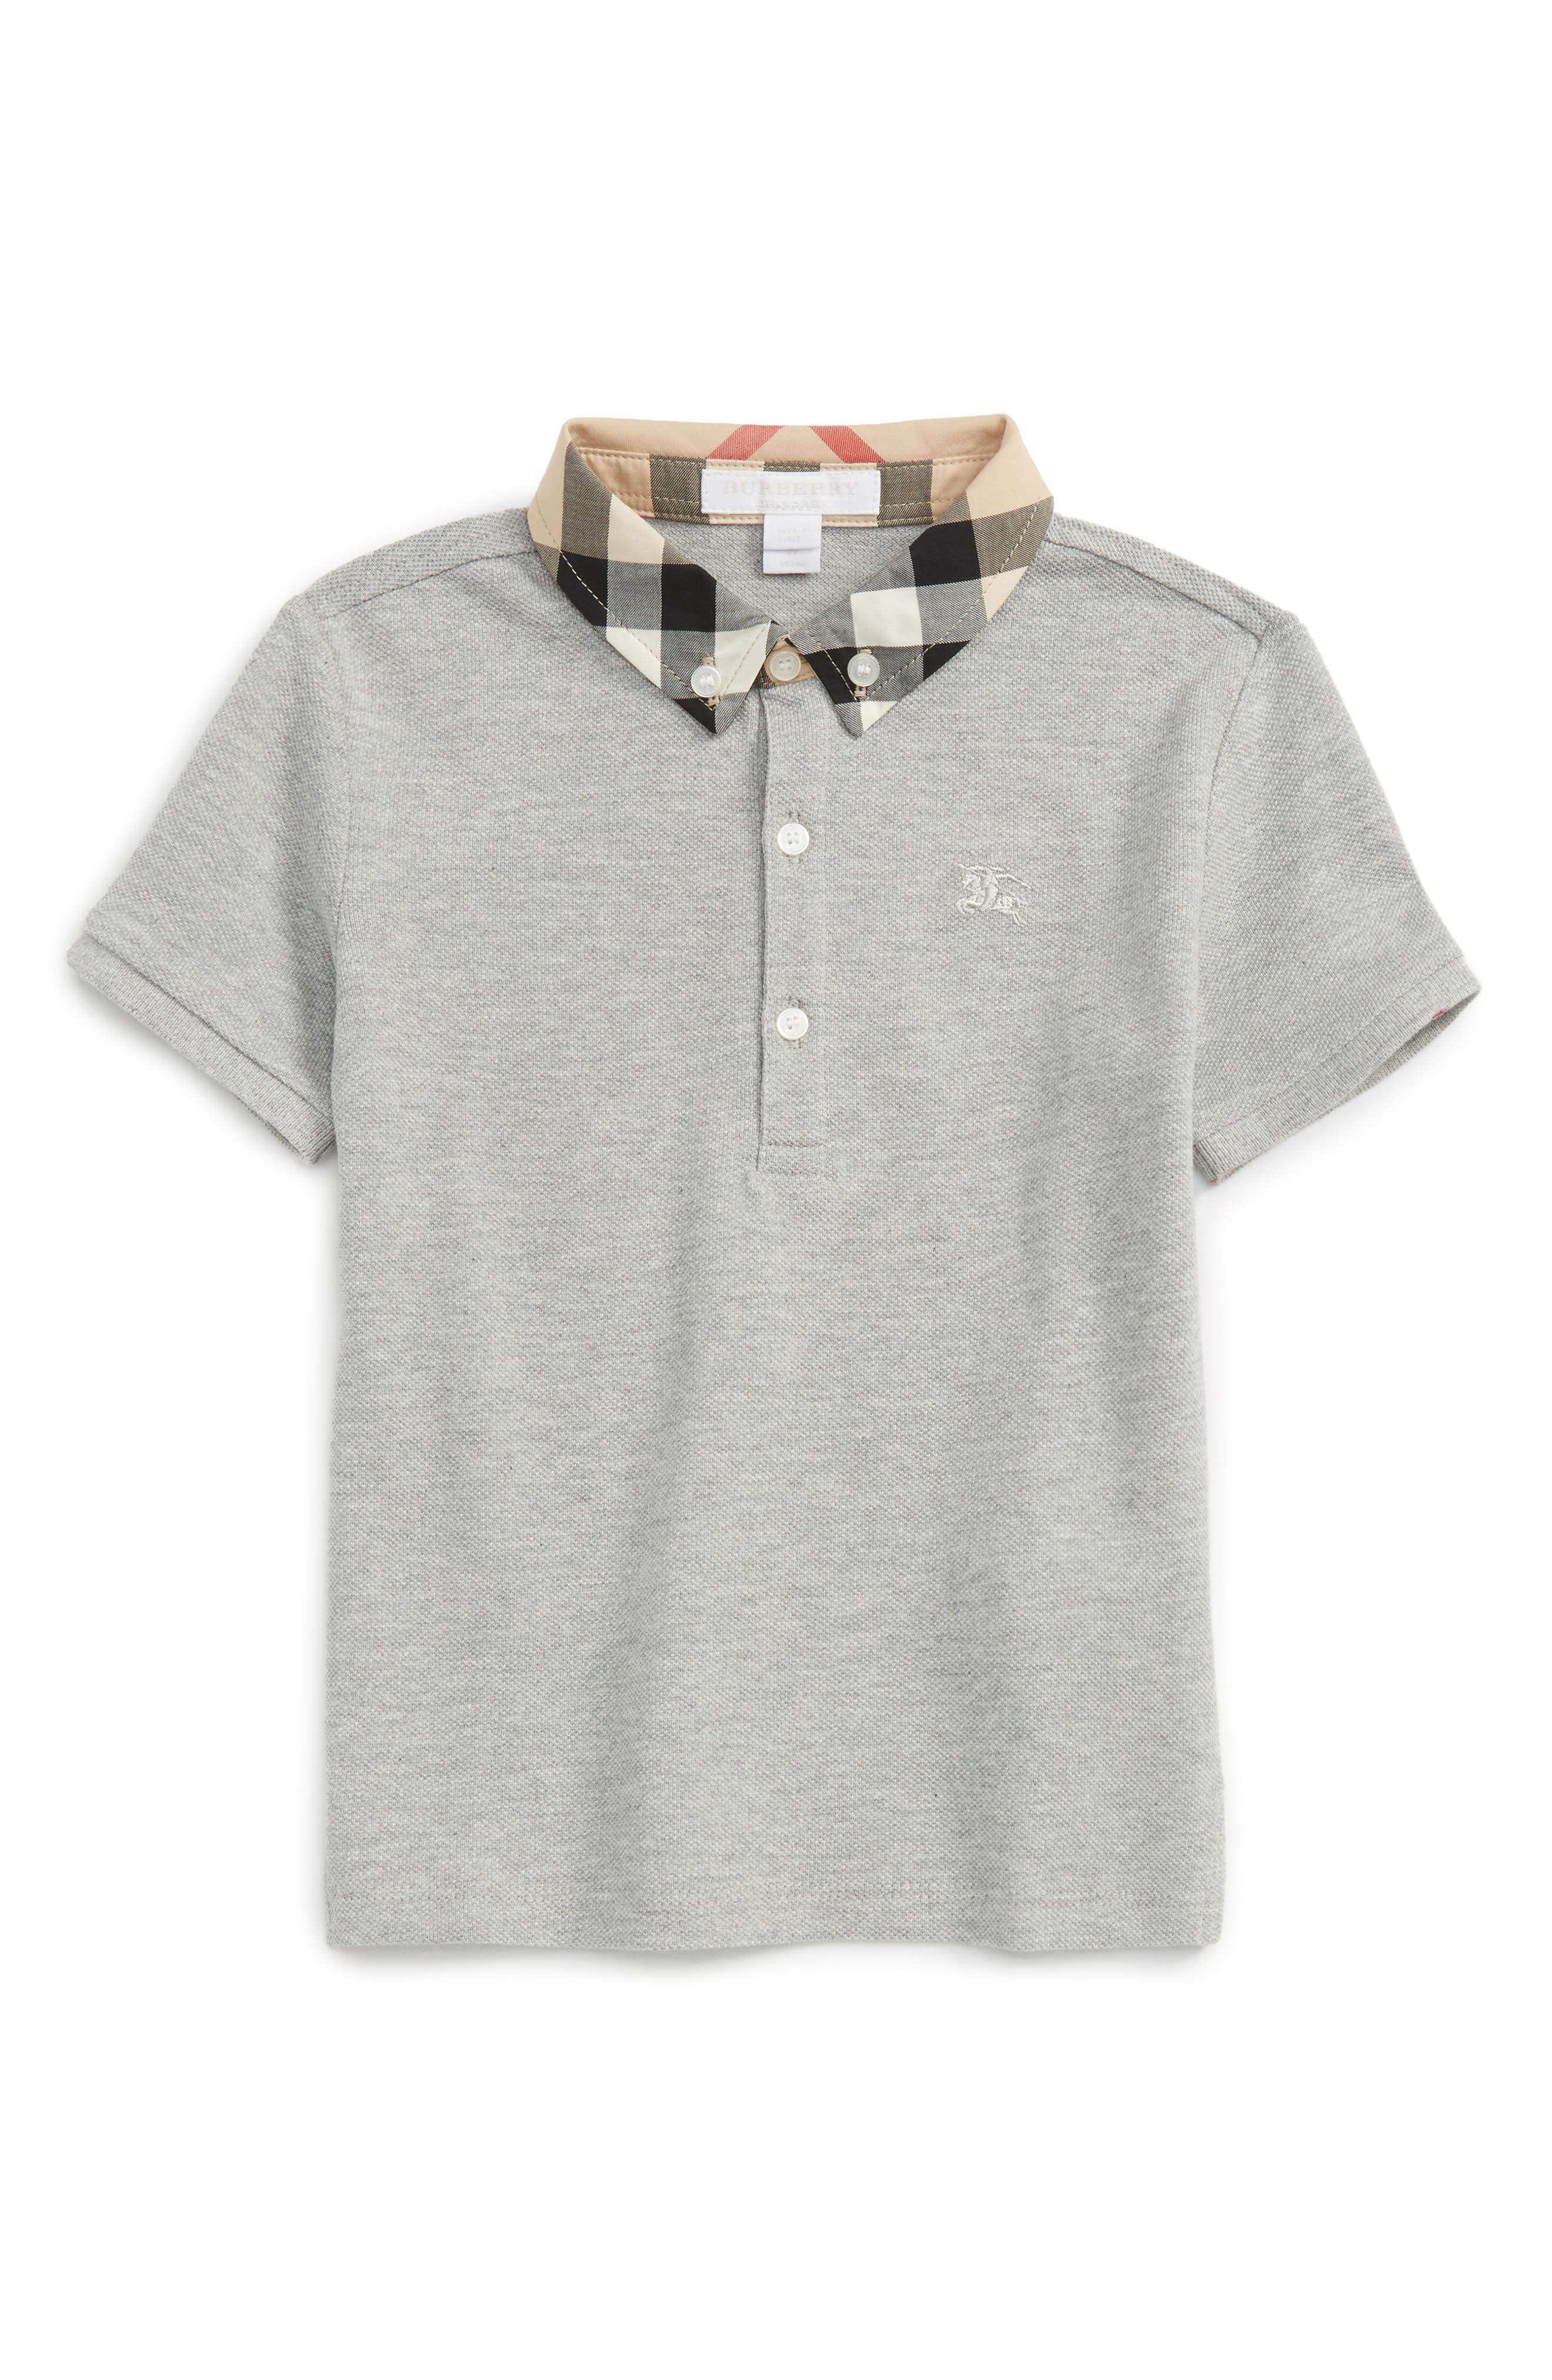 Check Collar Polo,                             Main thumbnail 1, color,                             Pale Grey Melange